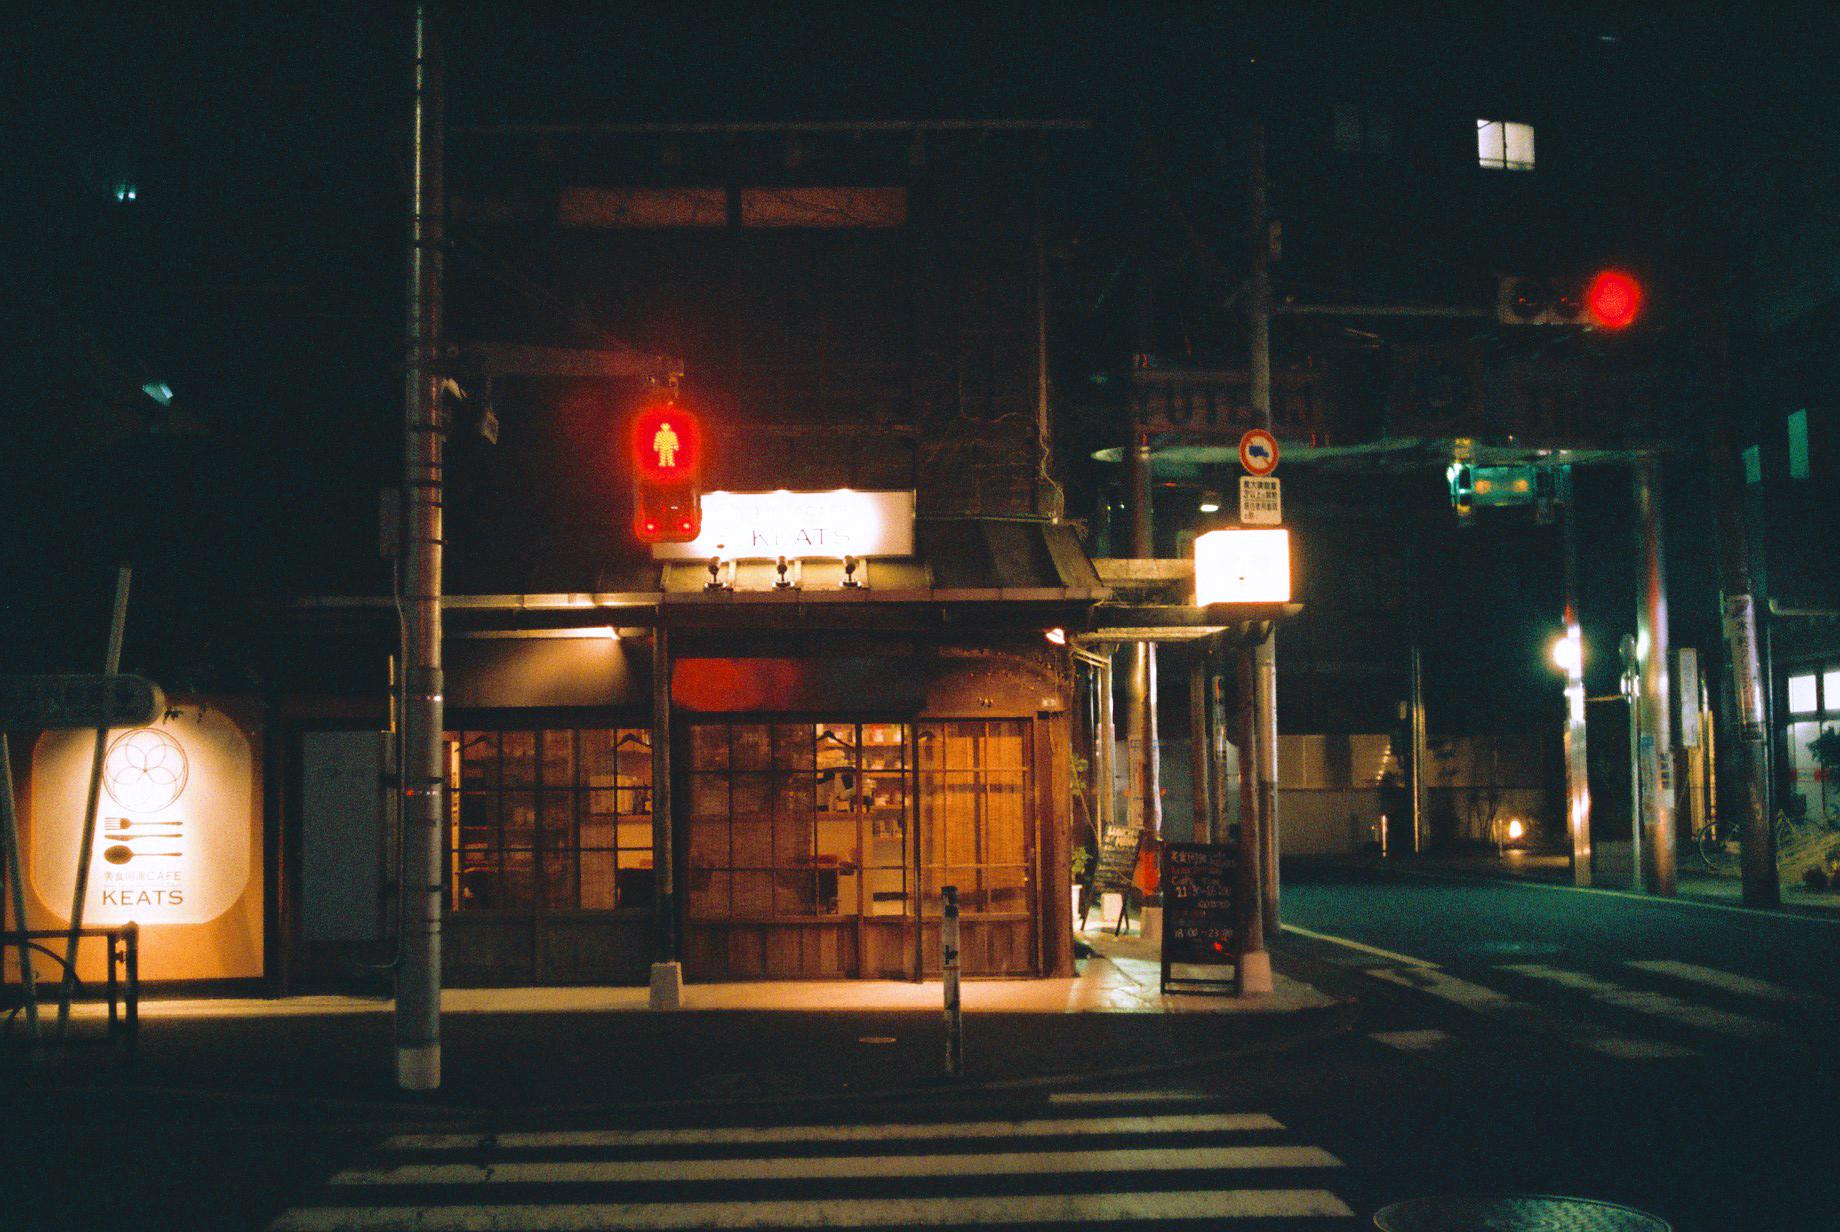 Popular Wallpaper Night Evening - Japan-street-light-street-night-evening-35MM-Tokyo-Electro-light-lighting-CC-fuji-film-darkness-400-35-yashica-superia-xtra-539764  Perfect Image Reference-843866.jpg